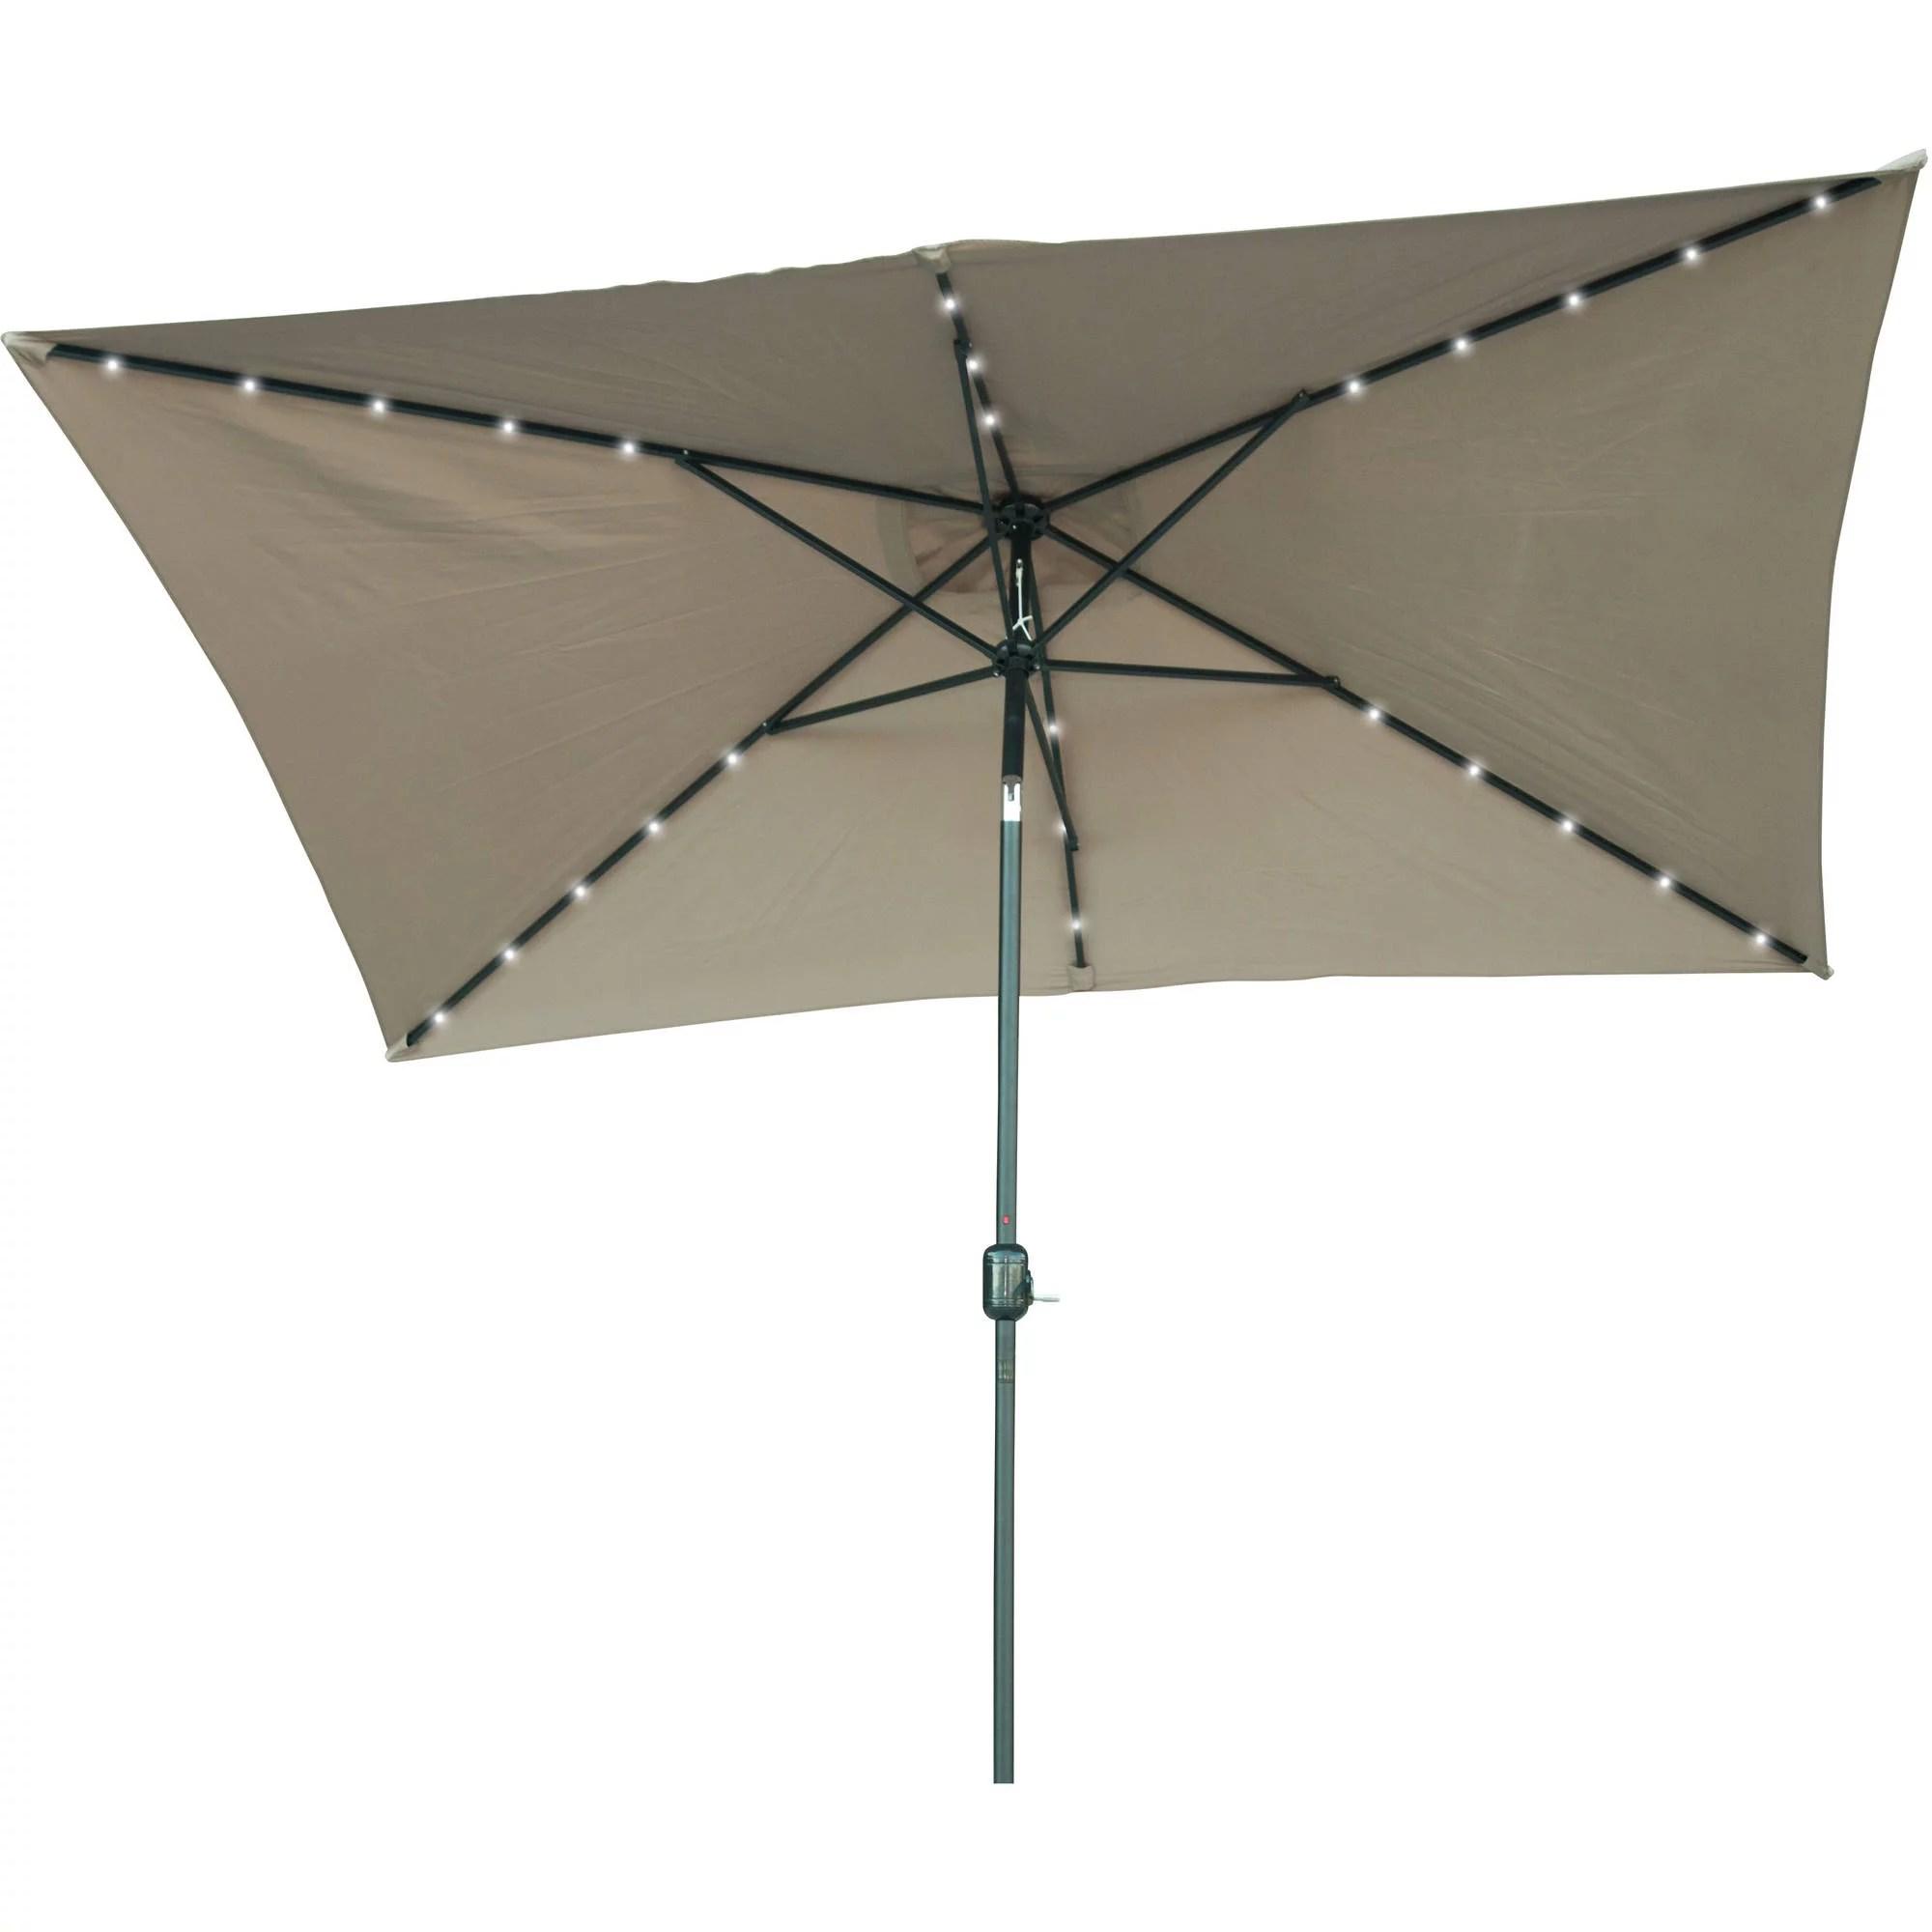 rectangular solar powered led lighted patio umbrella 10 x 6 5 by trademark innovations tan walmart com